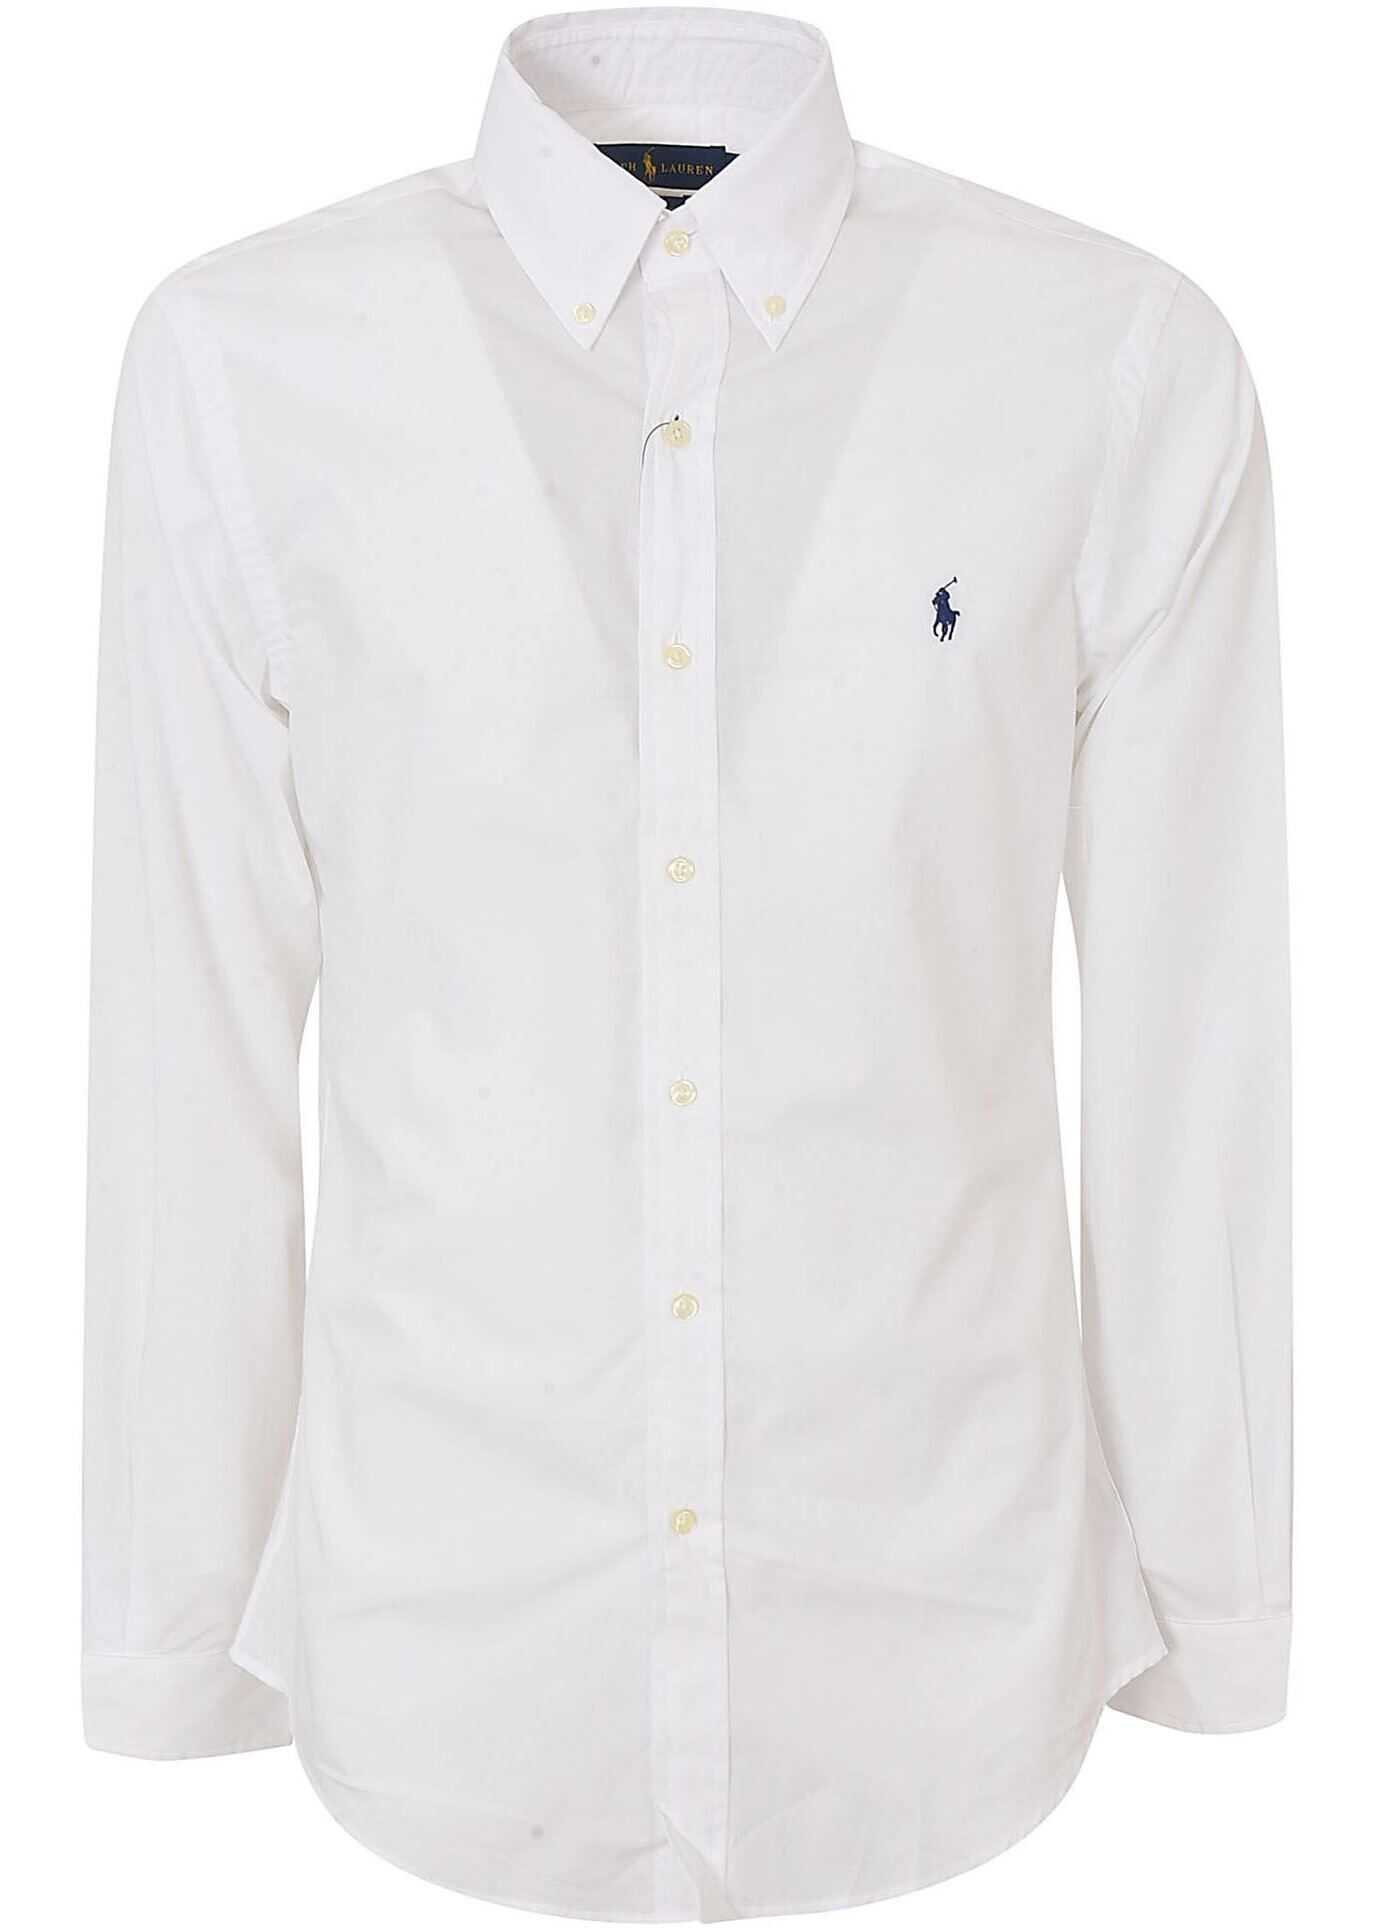 Ralph Lauren White Button-Down Shirt White imagine